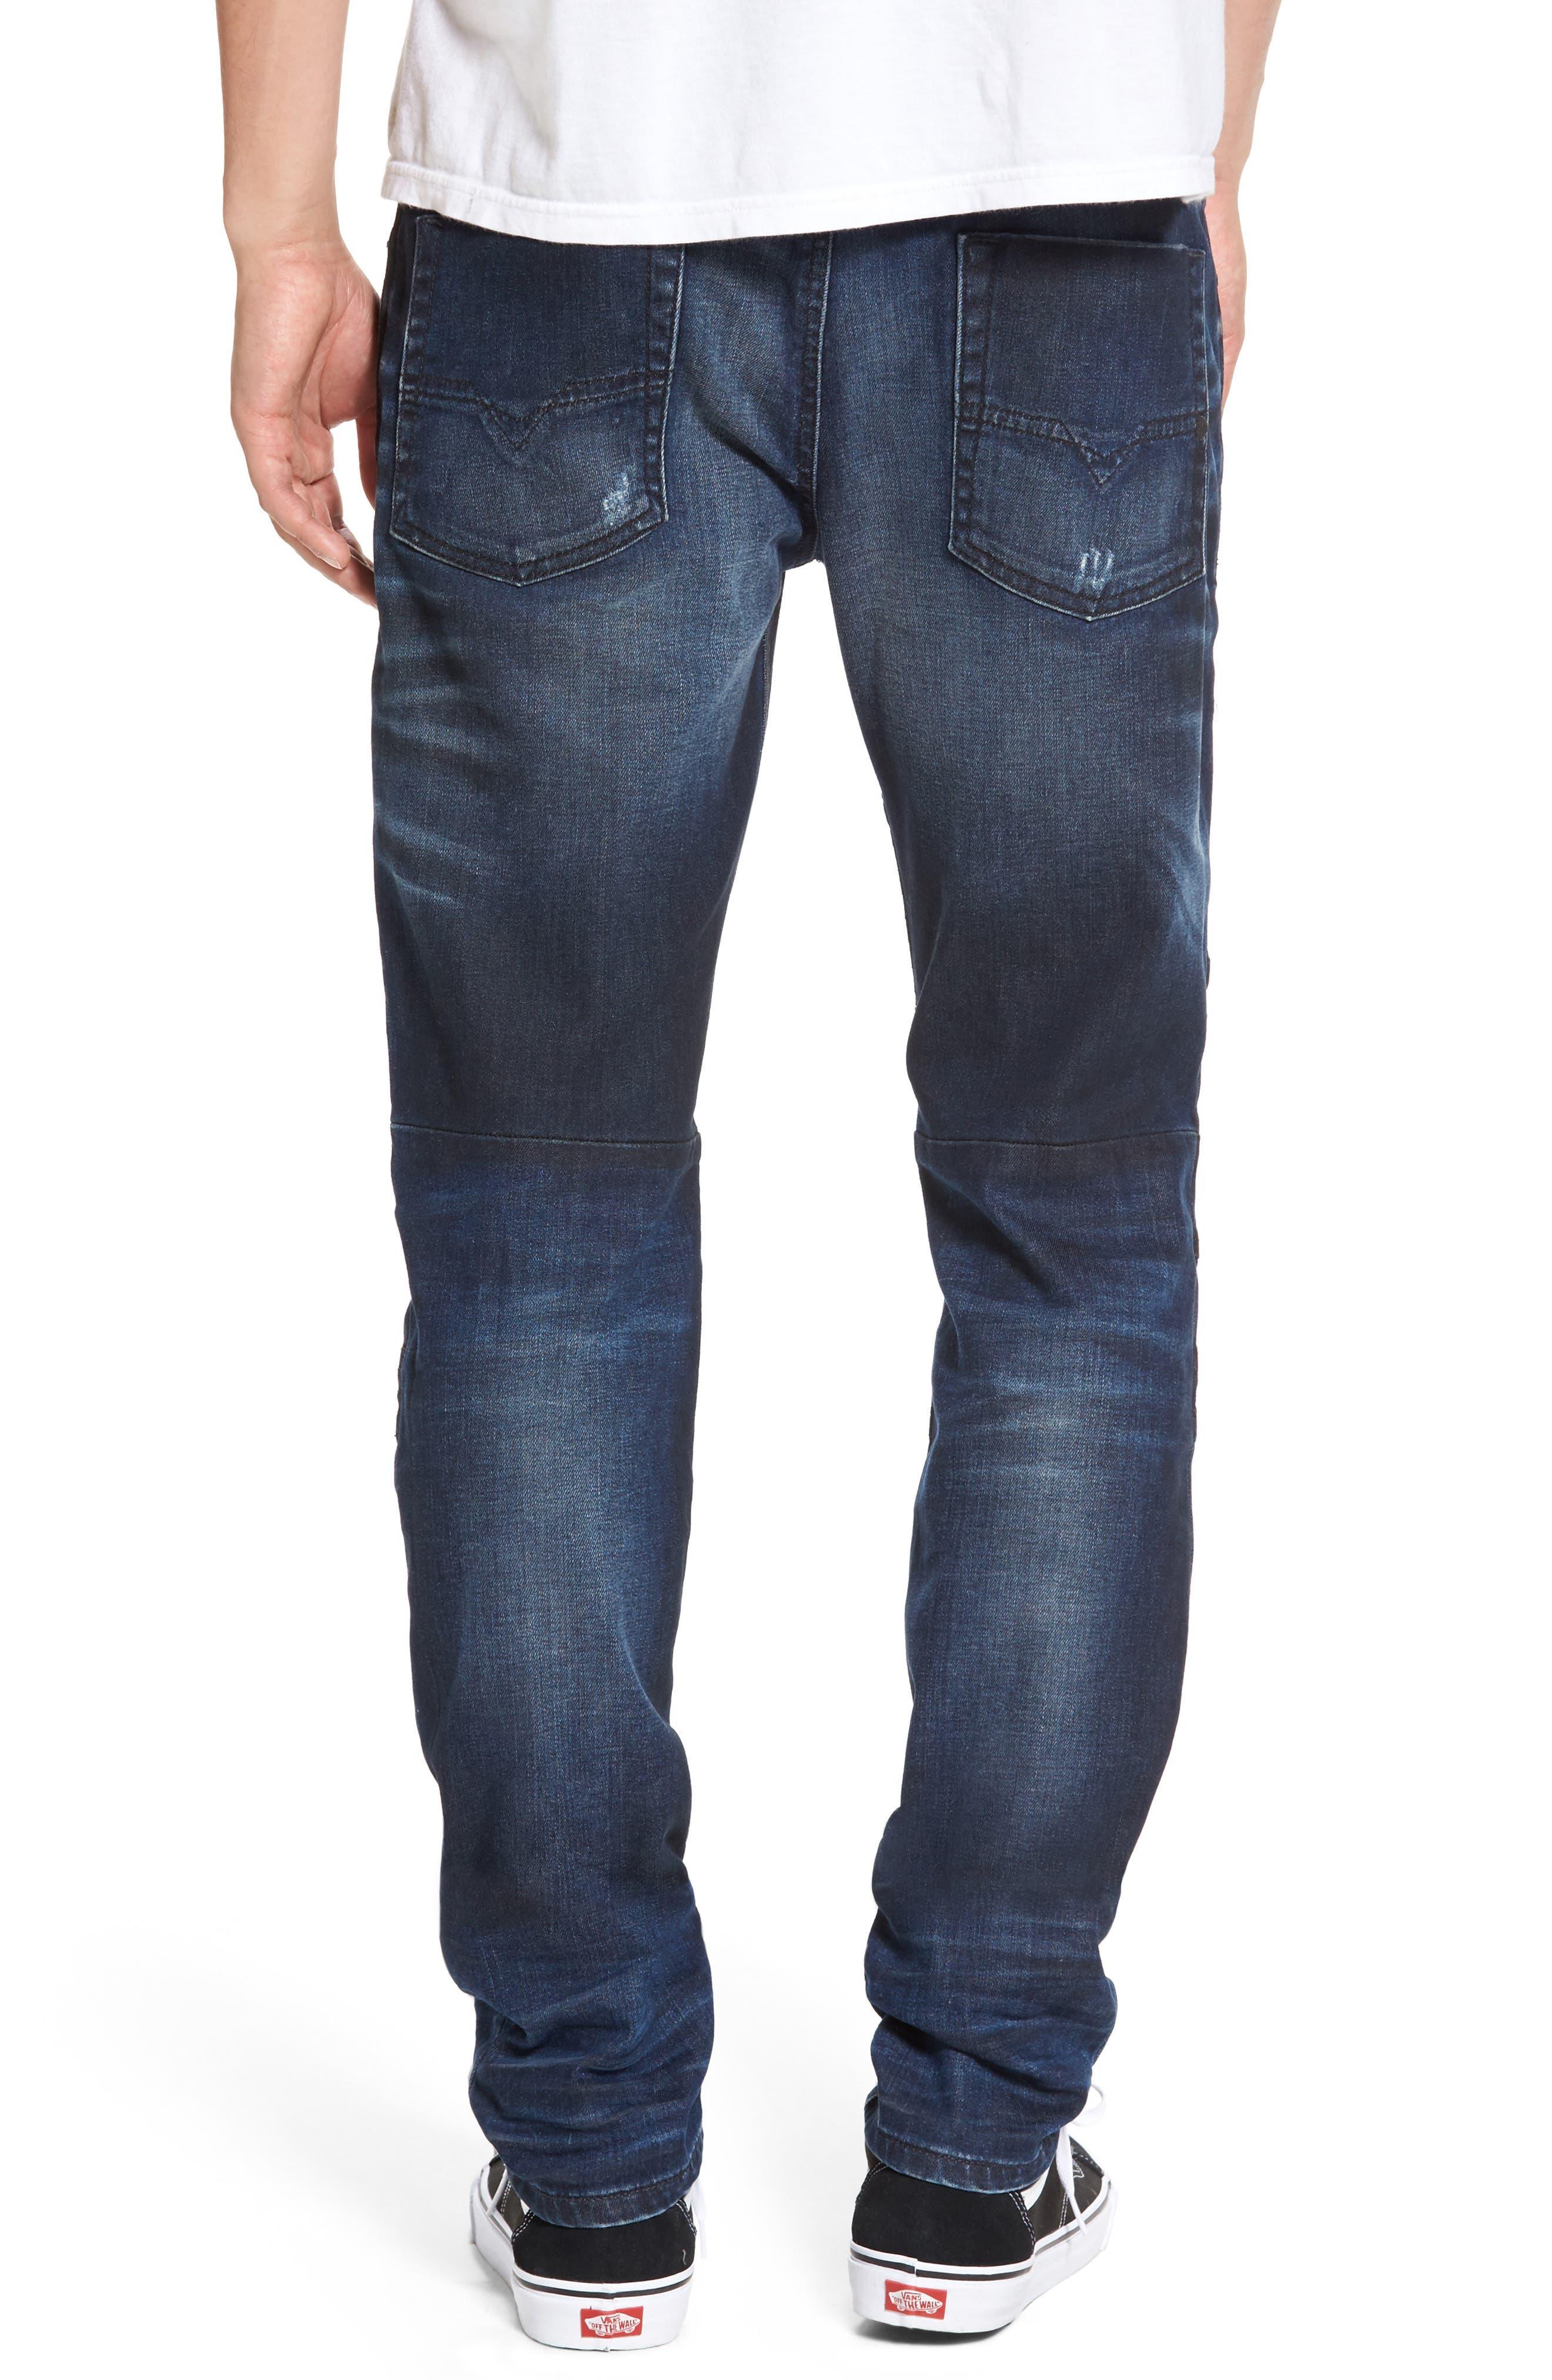 Fourk Skinny Fit Jeans,                             Alternate thumbnail 2, color,                             Denim